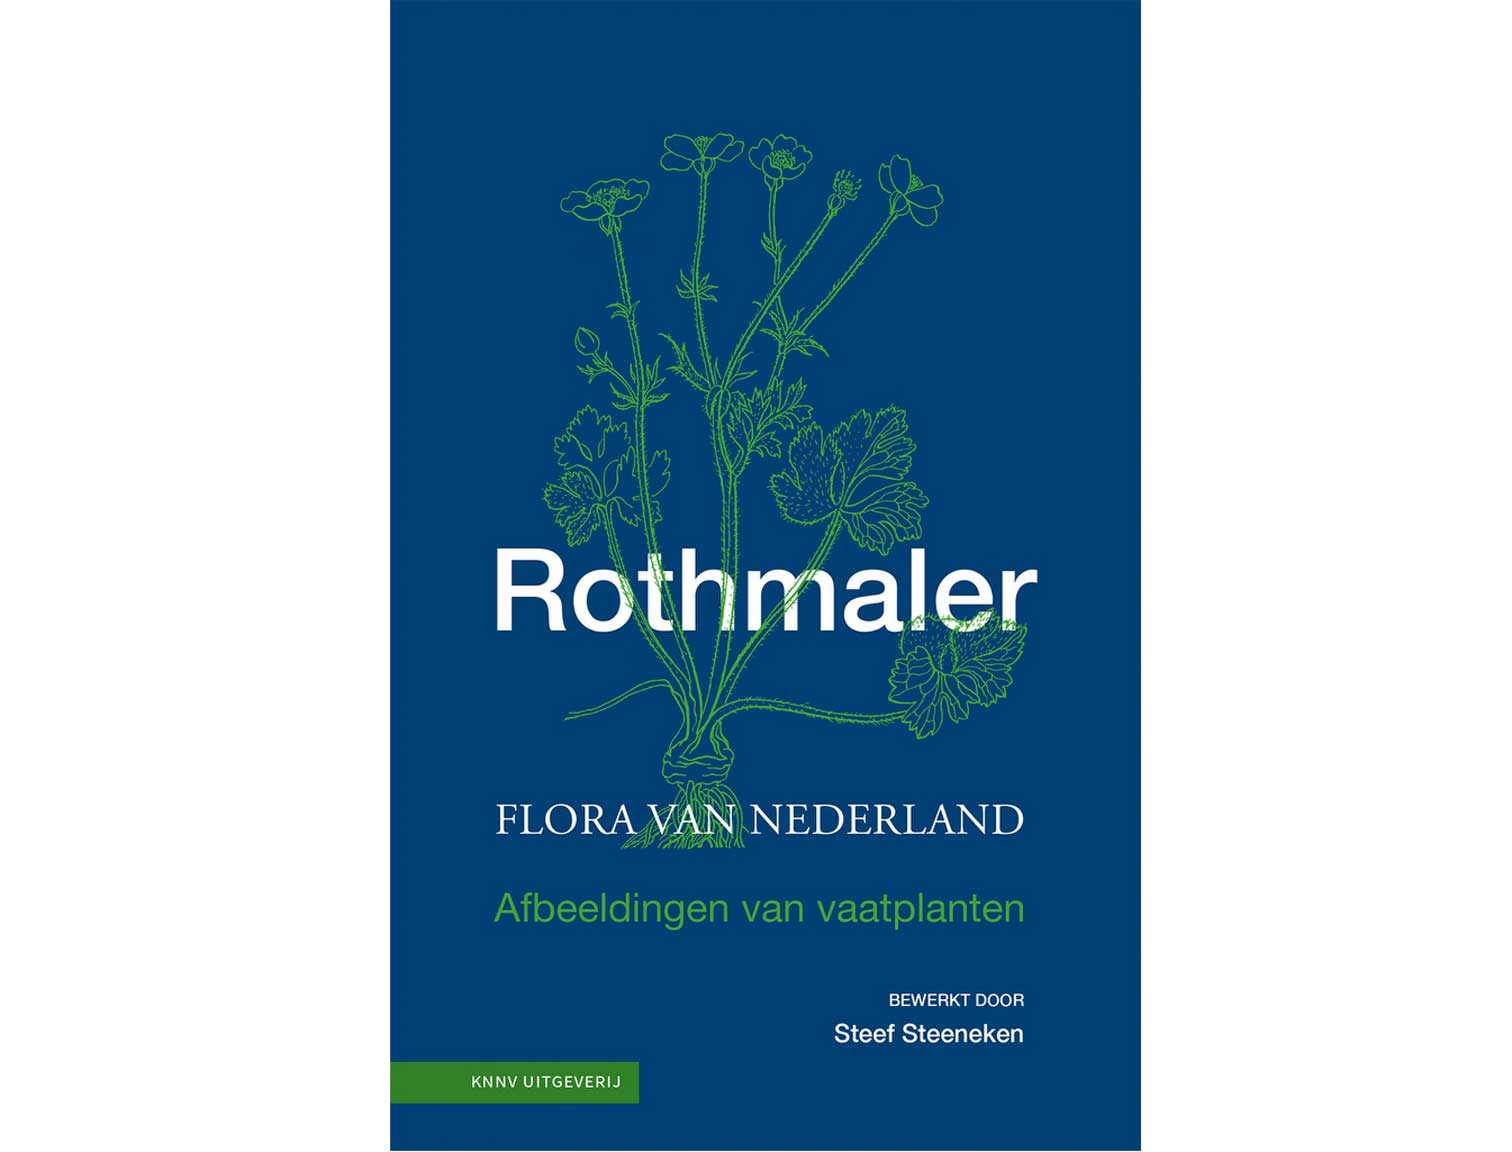 rothmaler(1)